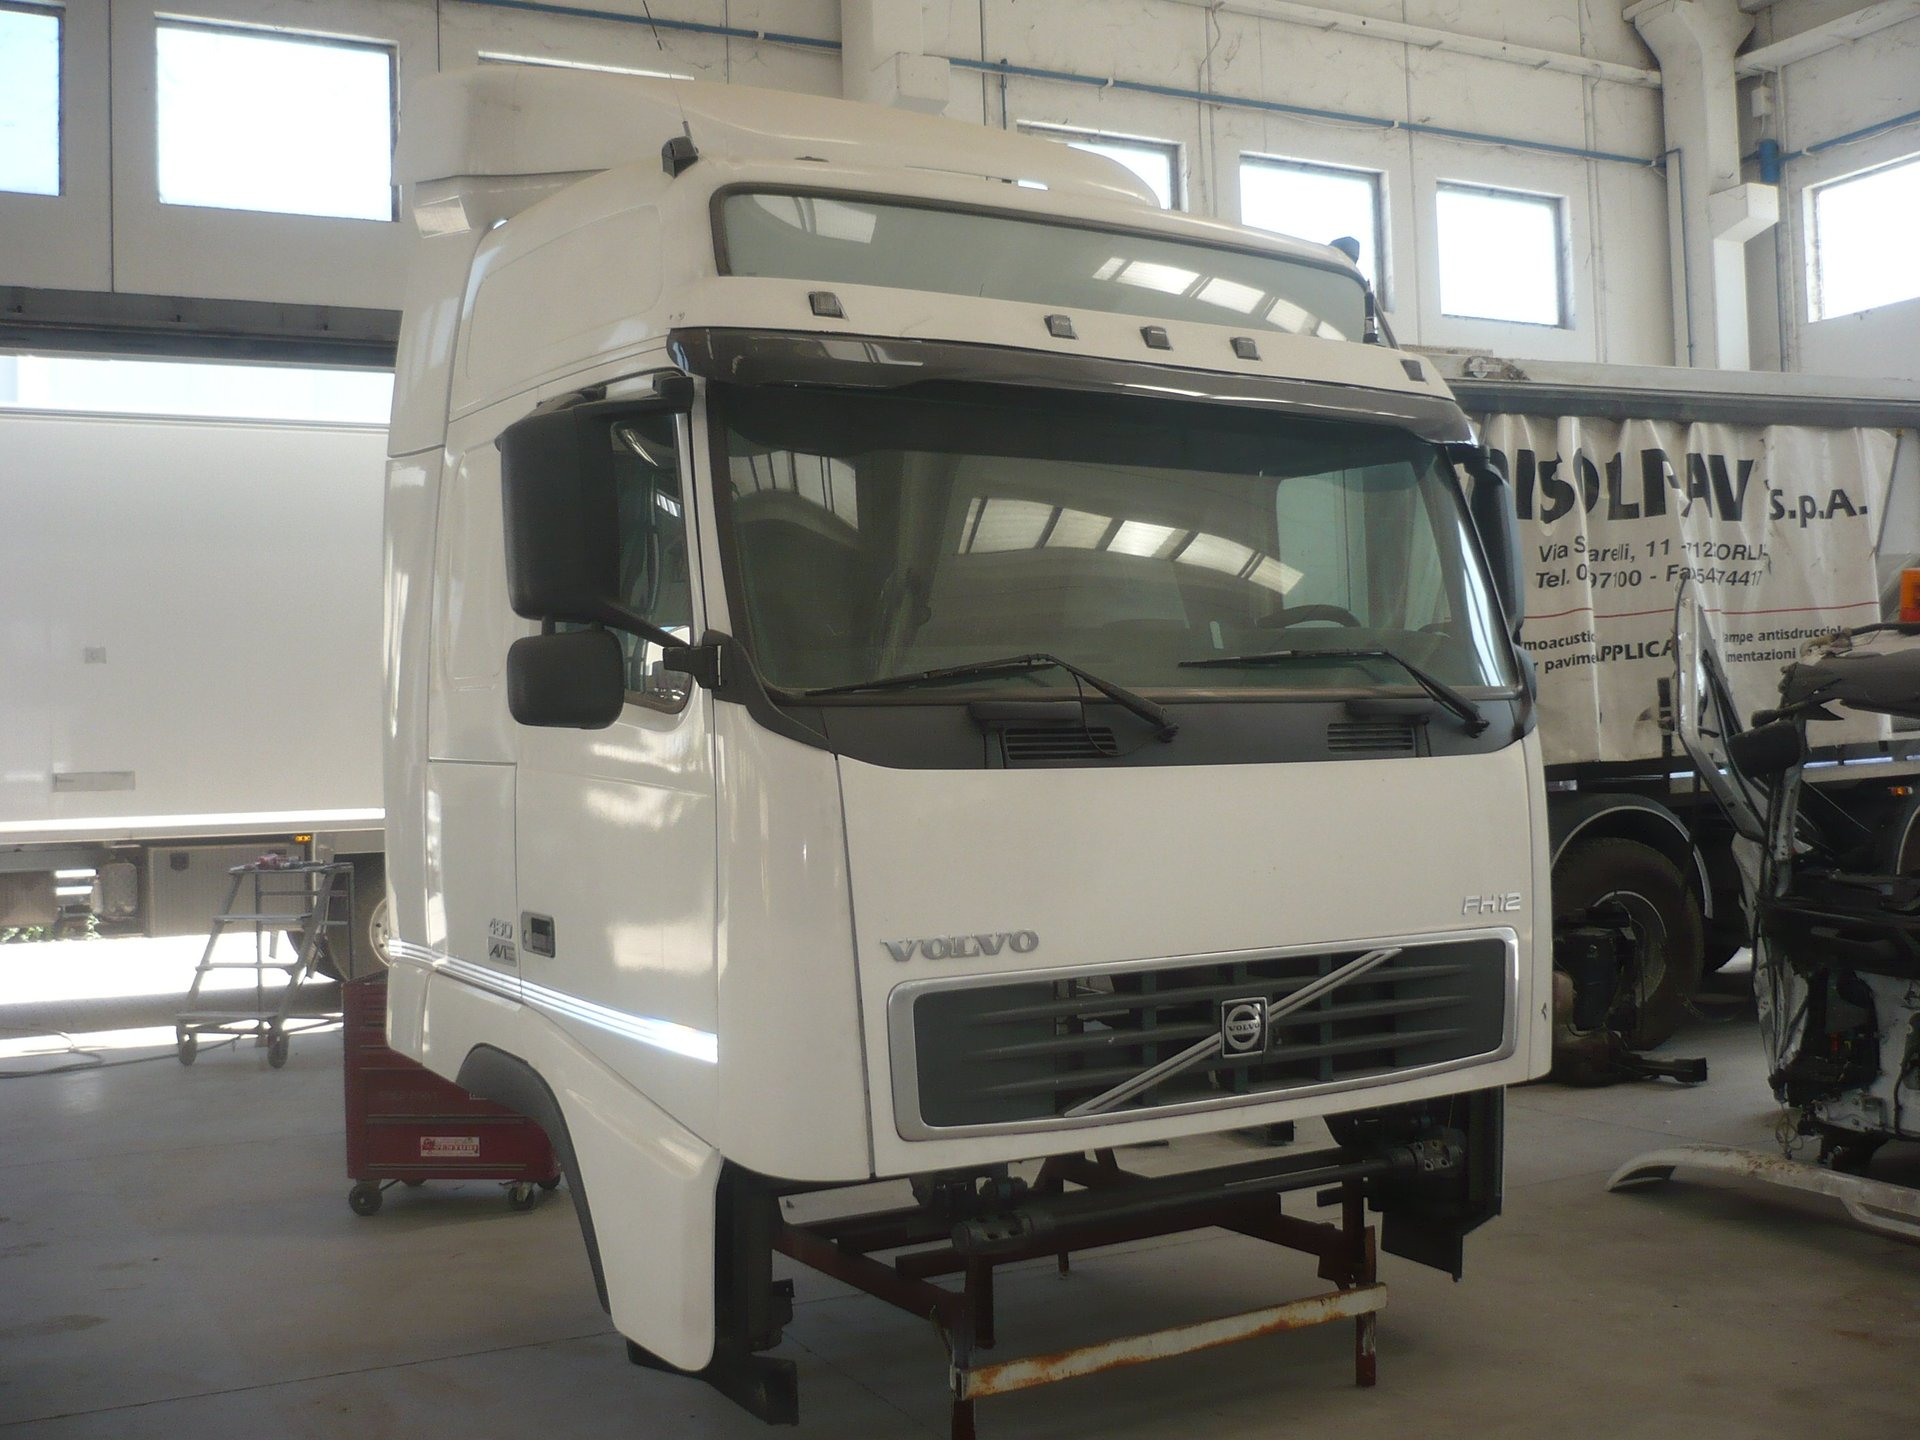 Cabina Volvo Fh V2 460 Gt Completa Vista Frontale Smontata